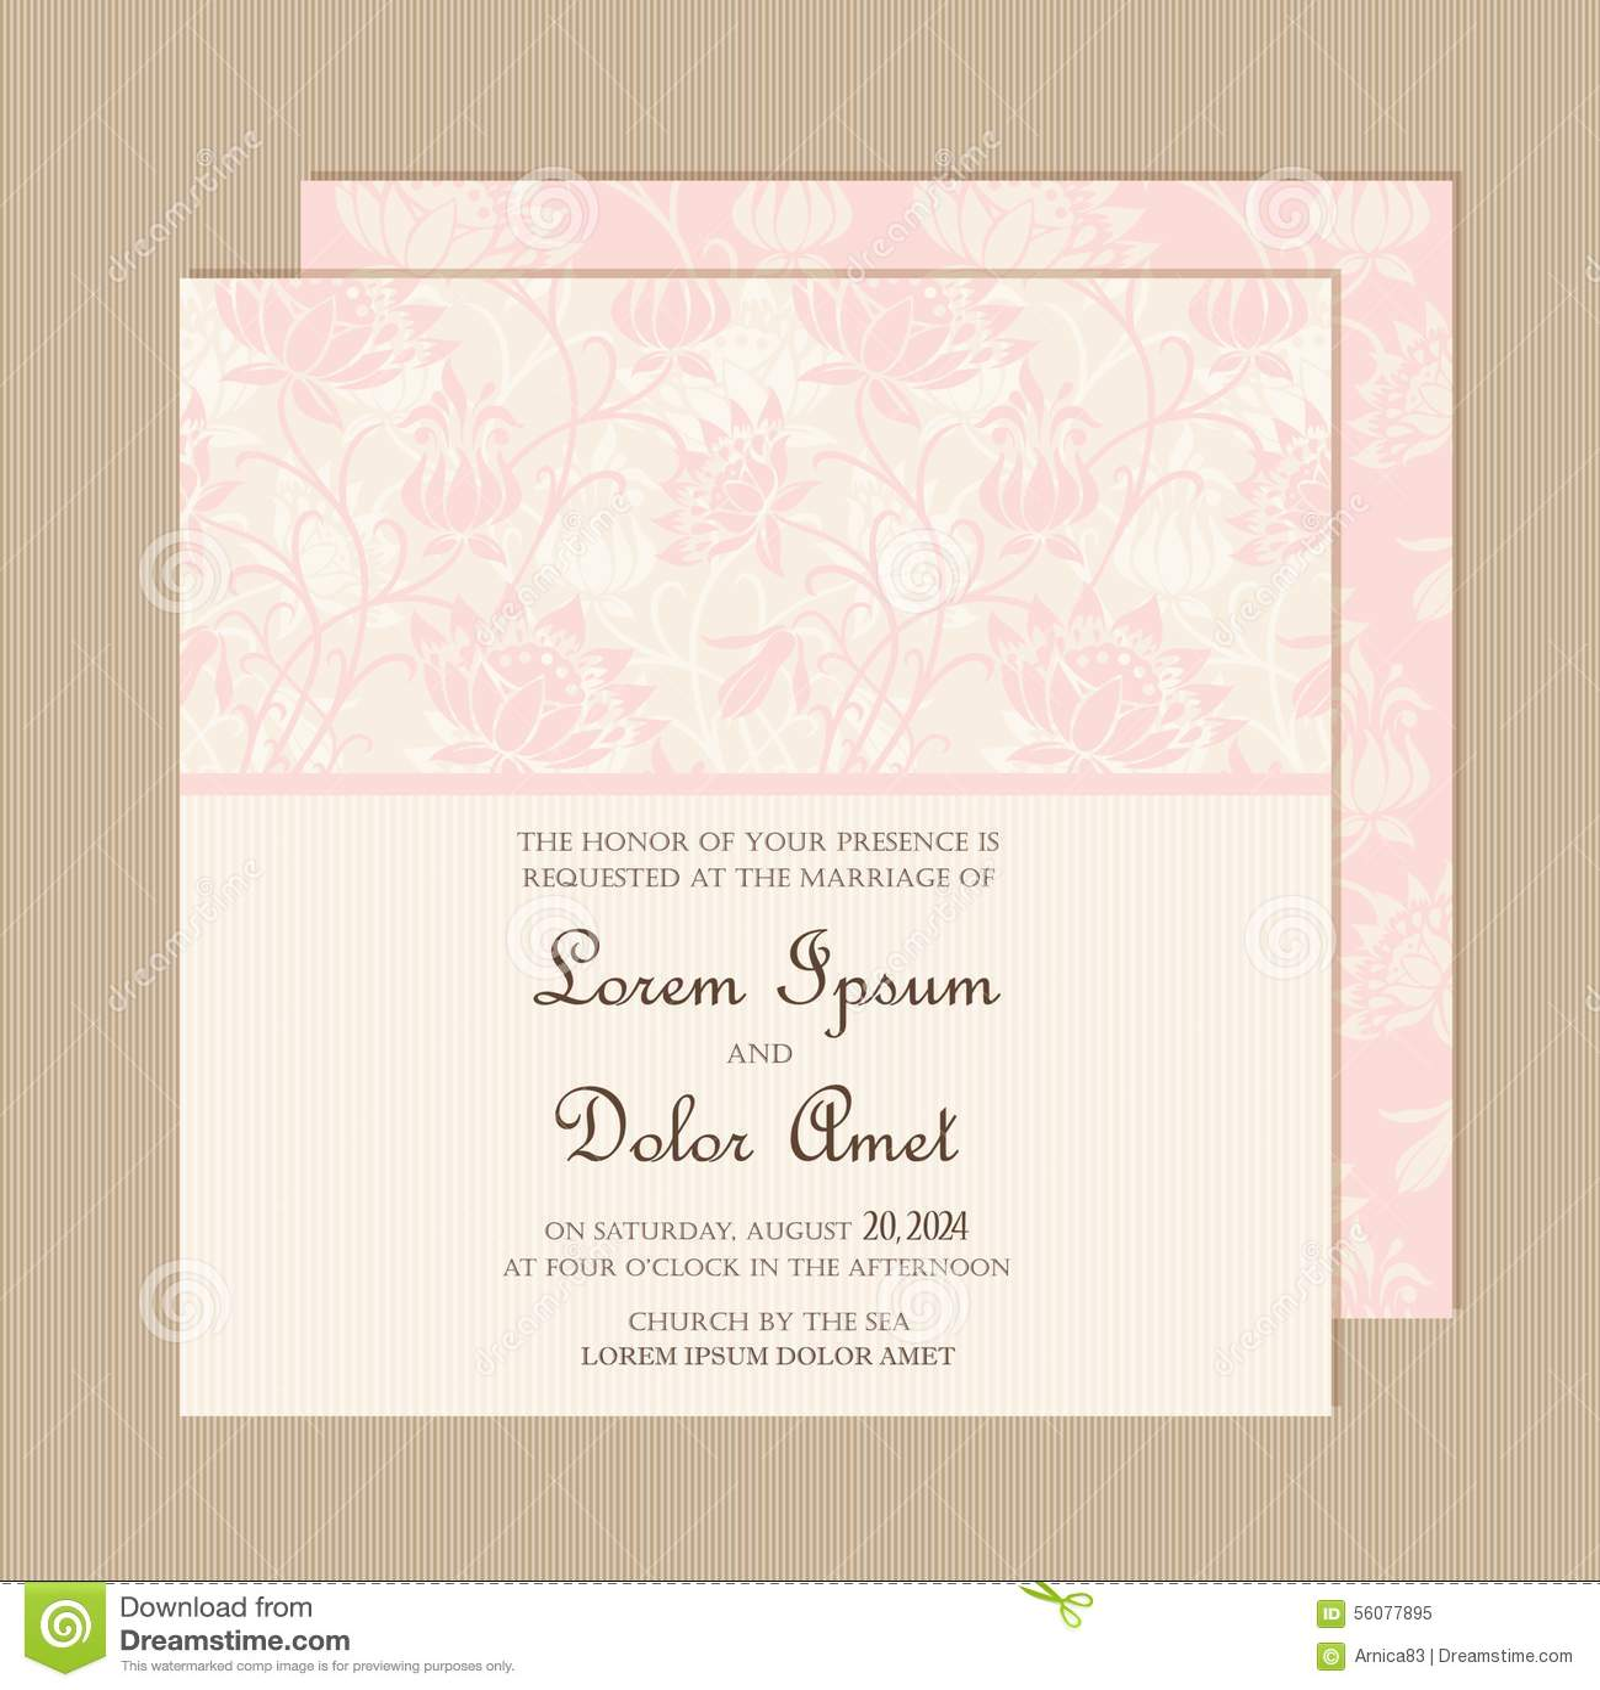 wedding invitation or announcement card stock vector illustration